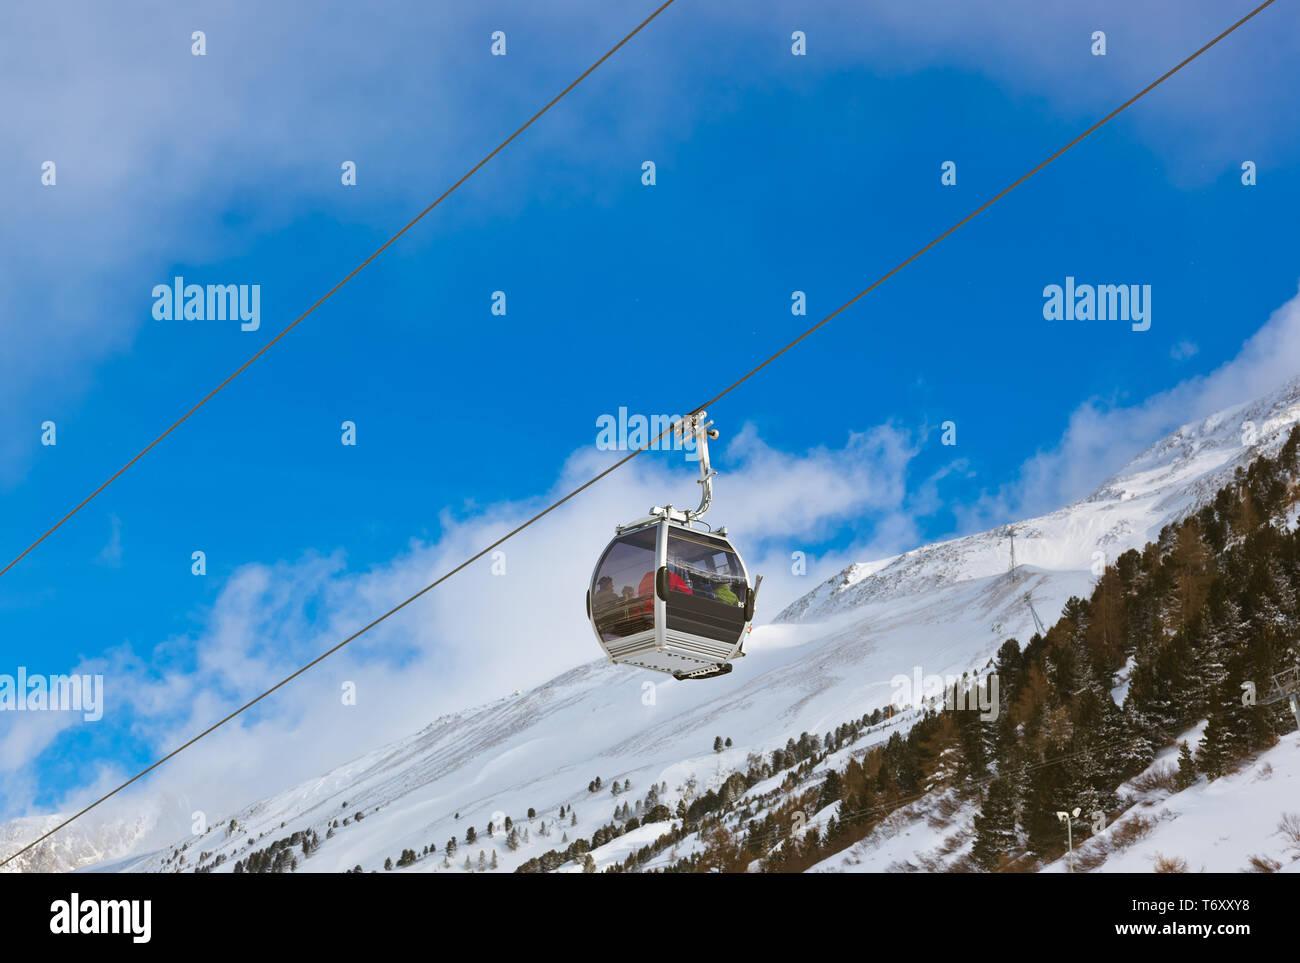 Mountain ski resort Obergurgl Austria - Stock Image